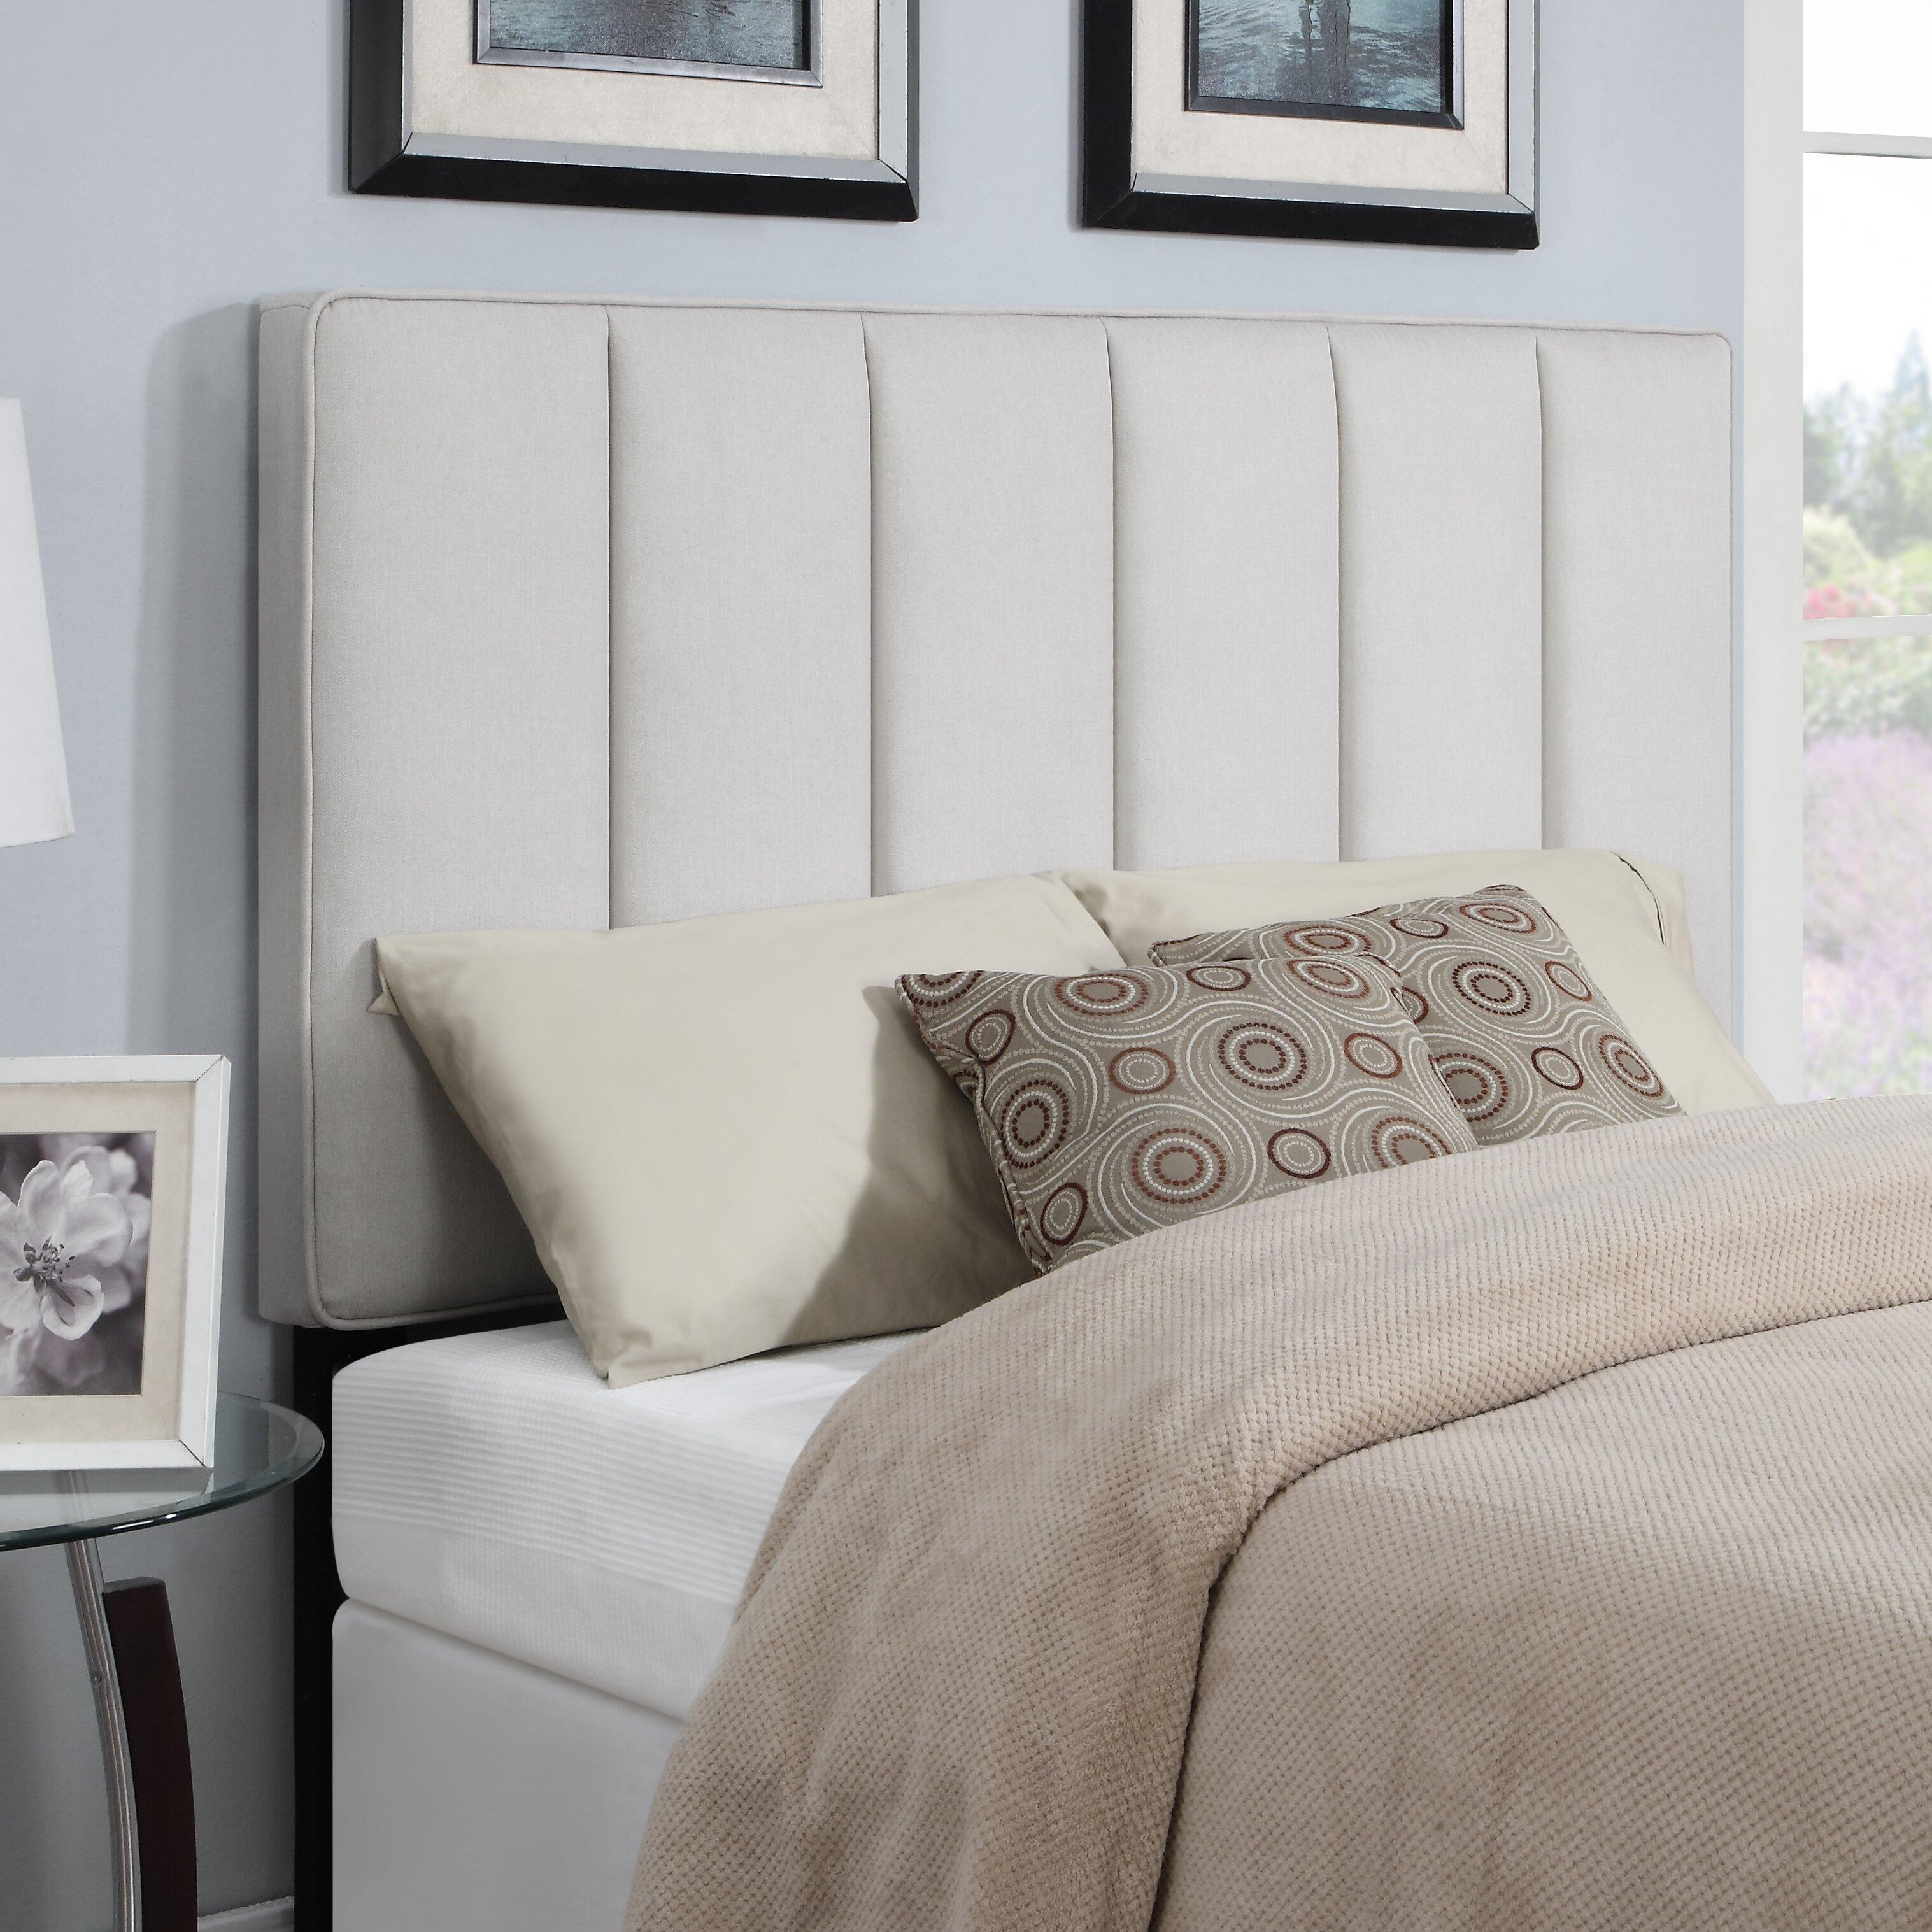 Ebern Designs Pettiford Upholstered Panel Headboard & Reviews